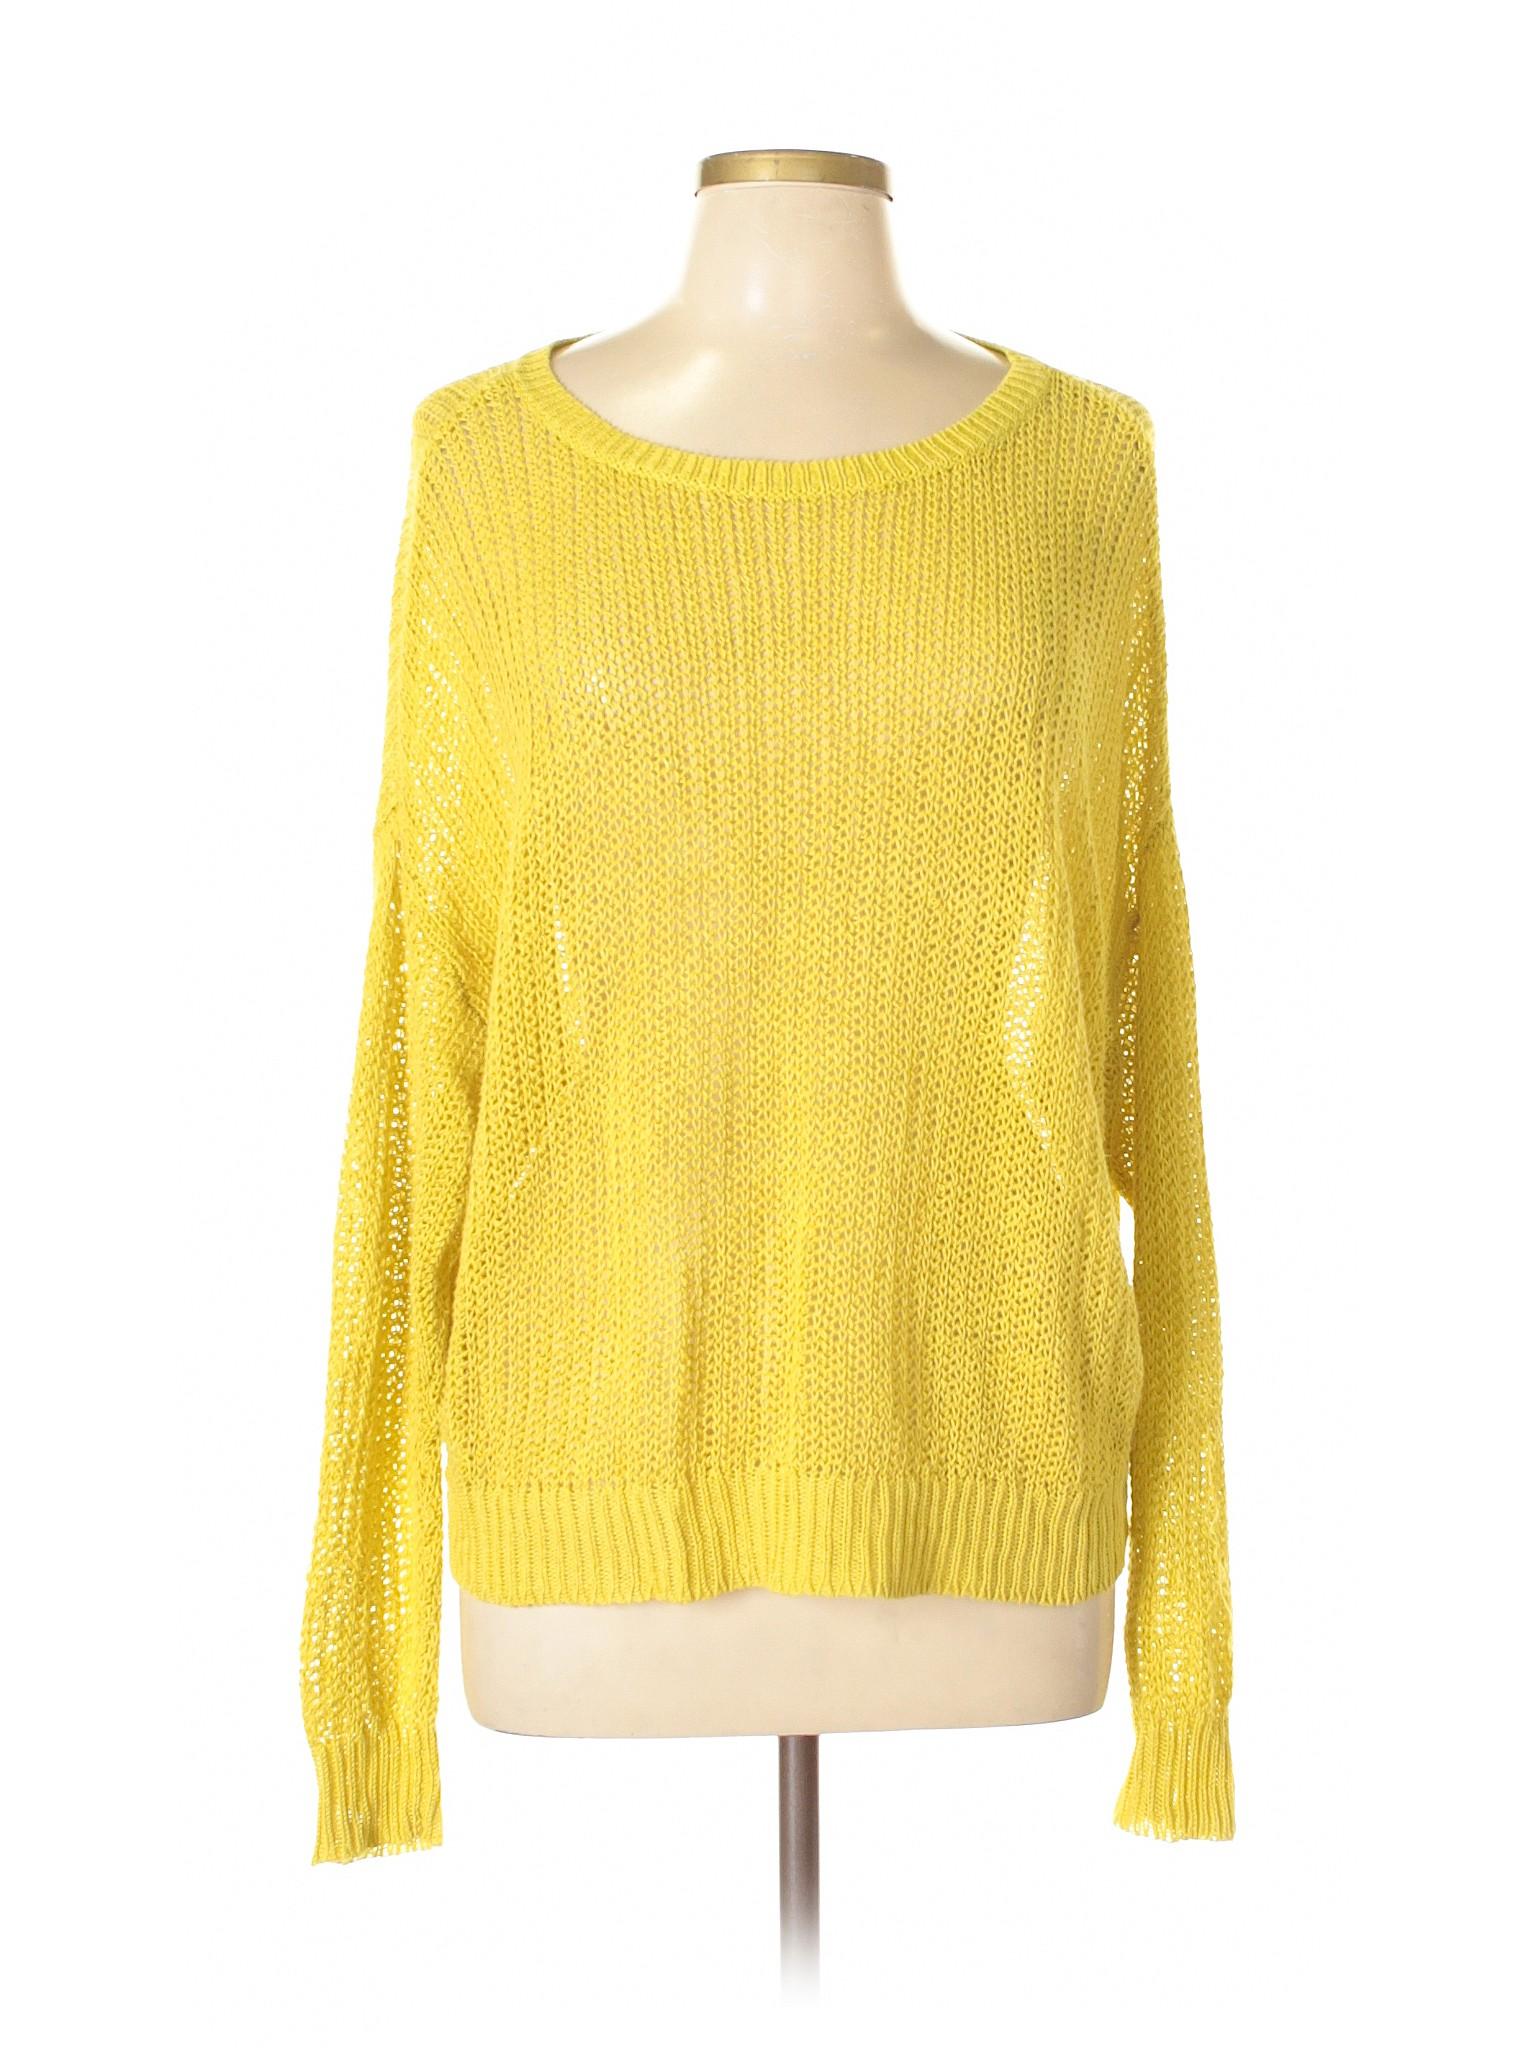 Pullover Boutique Eileen Fisher Fisher Boutique Pullover Sweater Eileen xEYqWaEnP